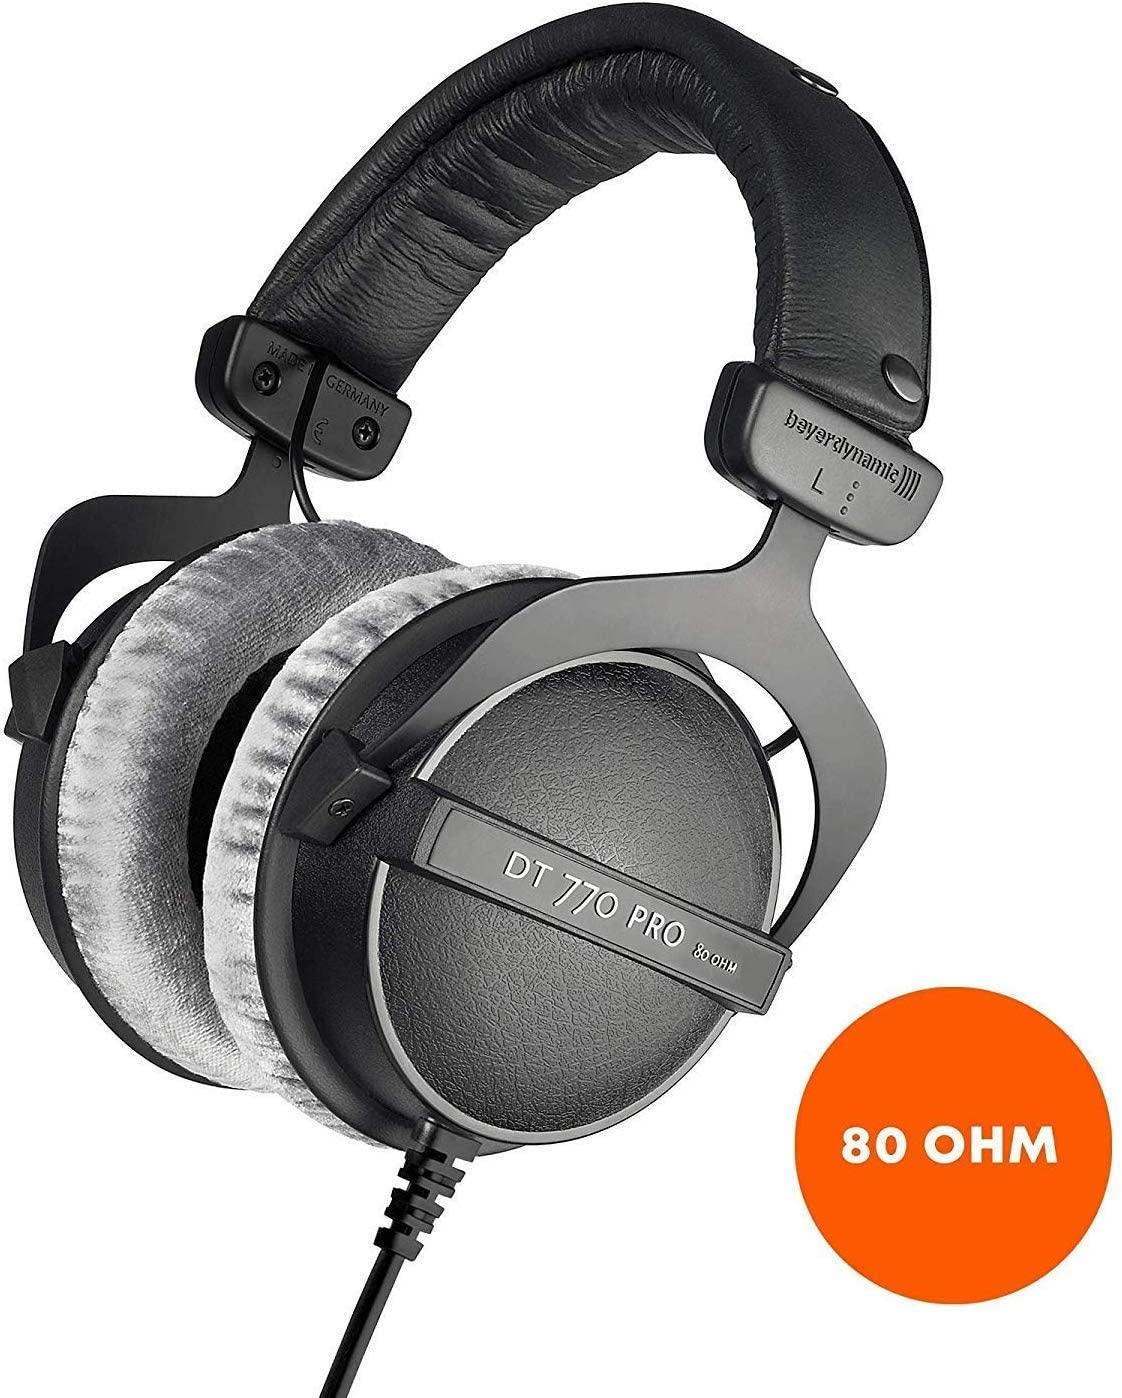 beyerdynamic DT 770 PRO Studio Headphones - 80 Ohm £90 delivered at Amazon